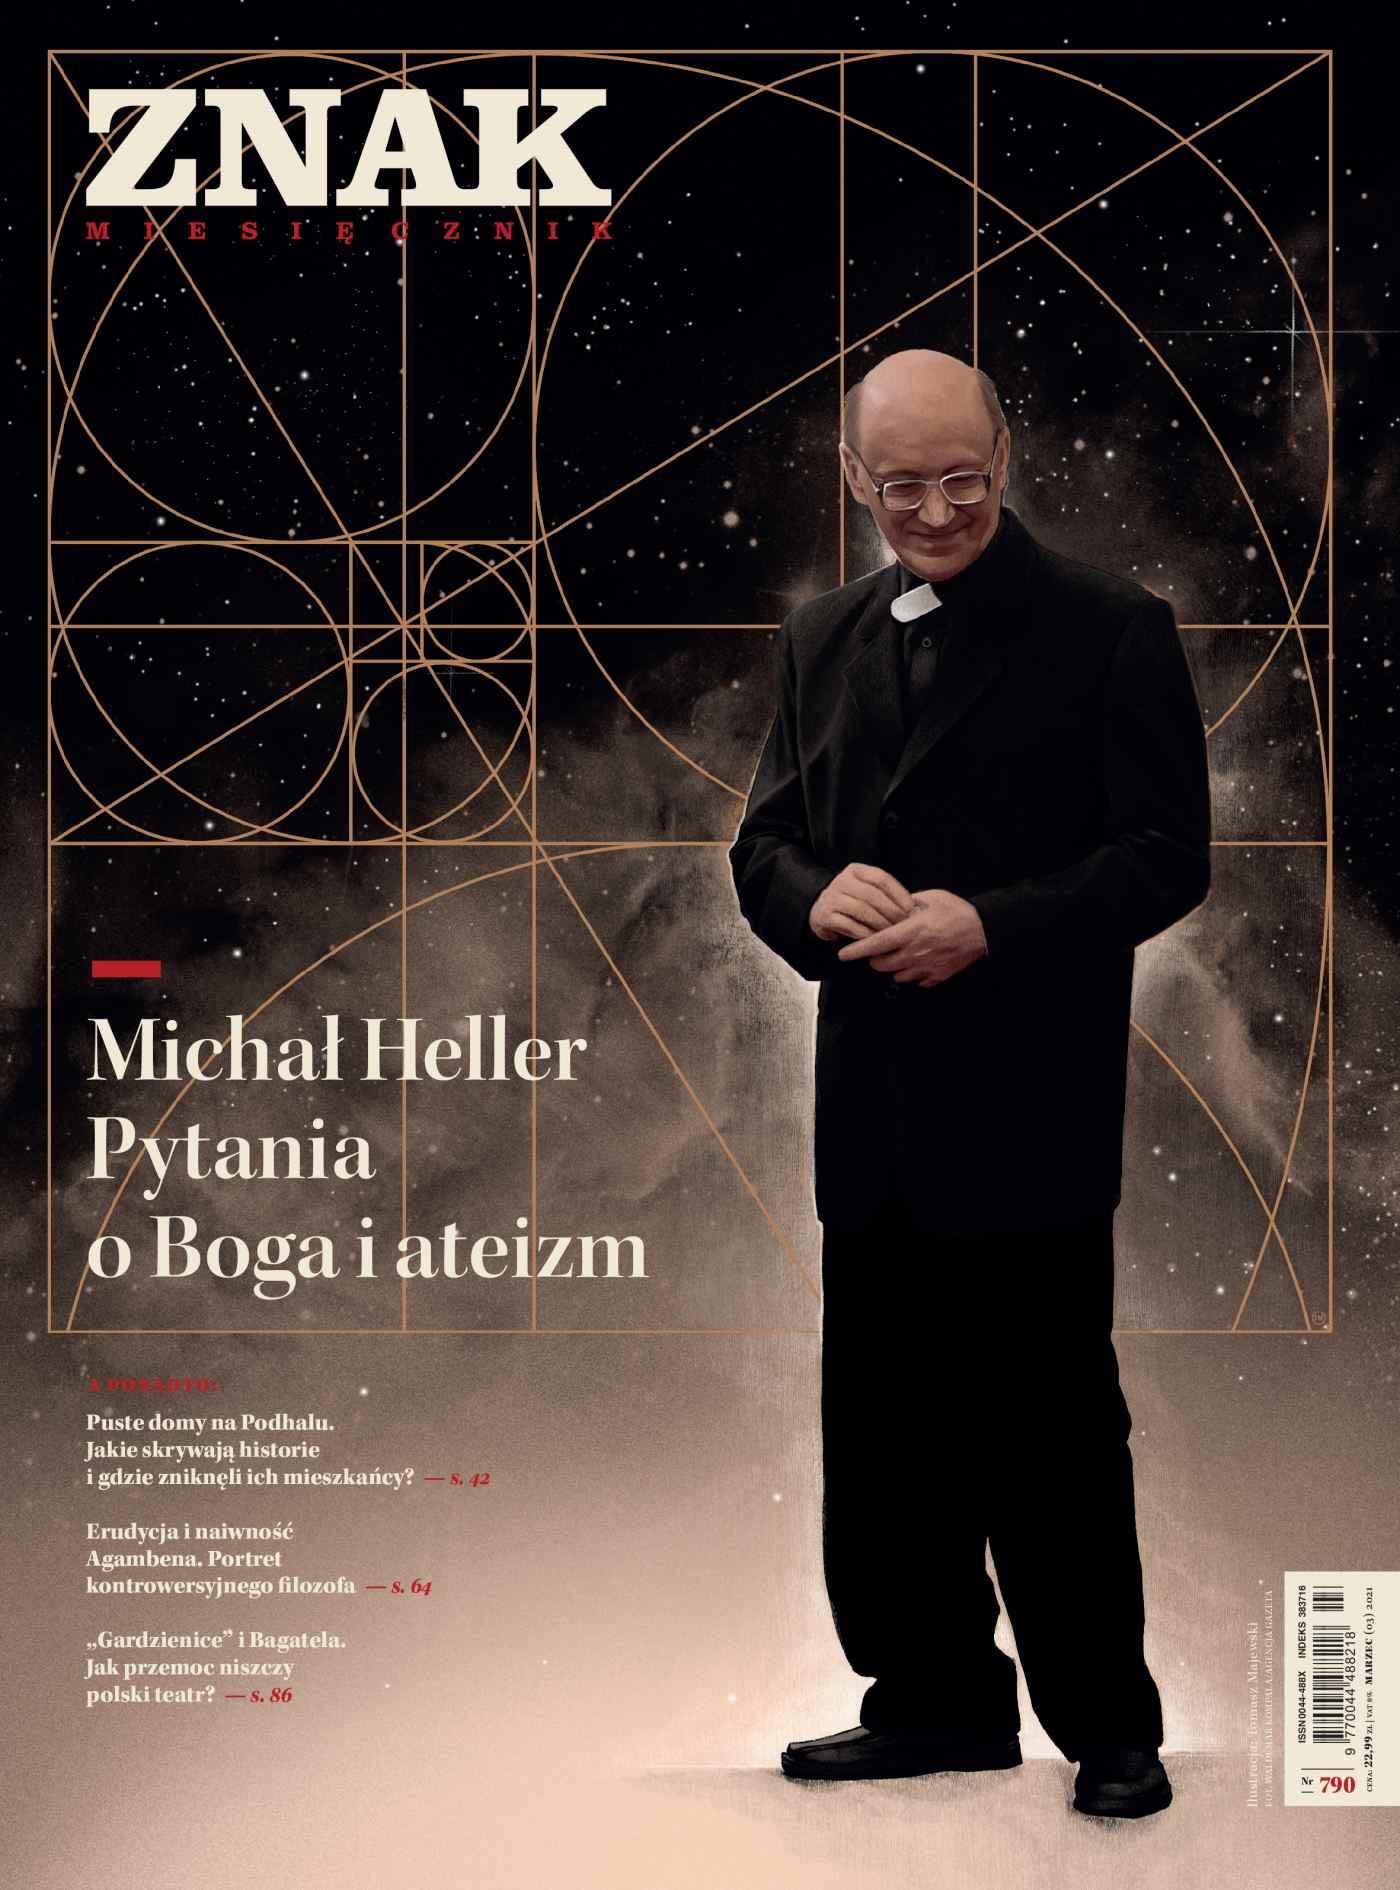 Miesięcznik Znak nr 790. Michał Heller. Pytania o Boga i ateizm - Ebook (Książka EPUB) do pobrania w formacie EPUB